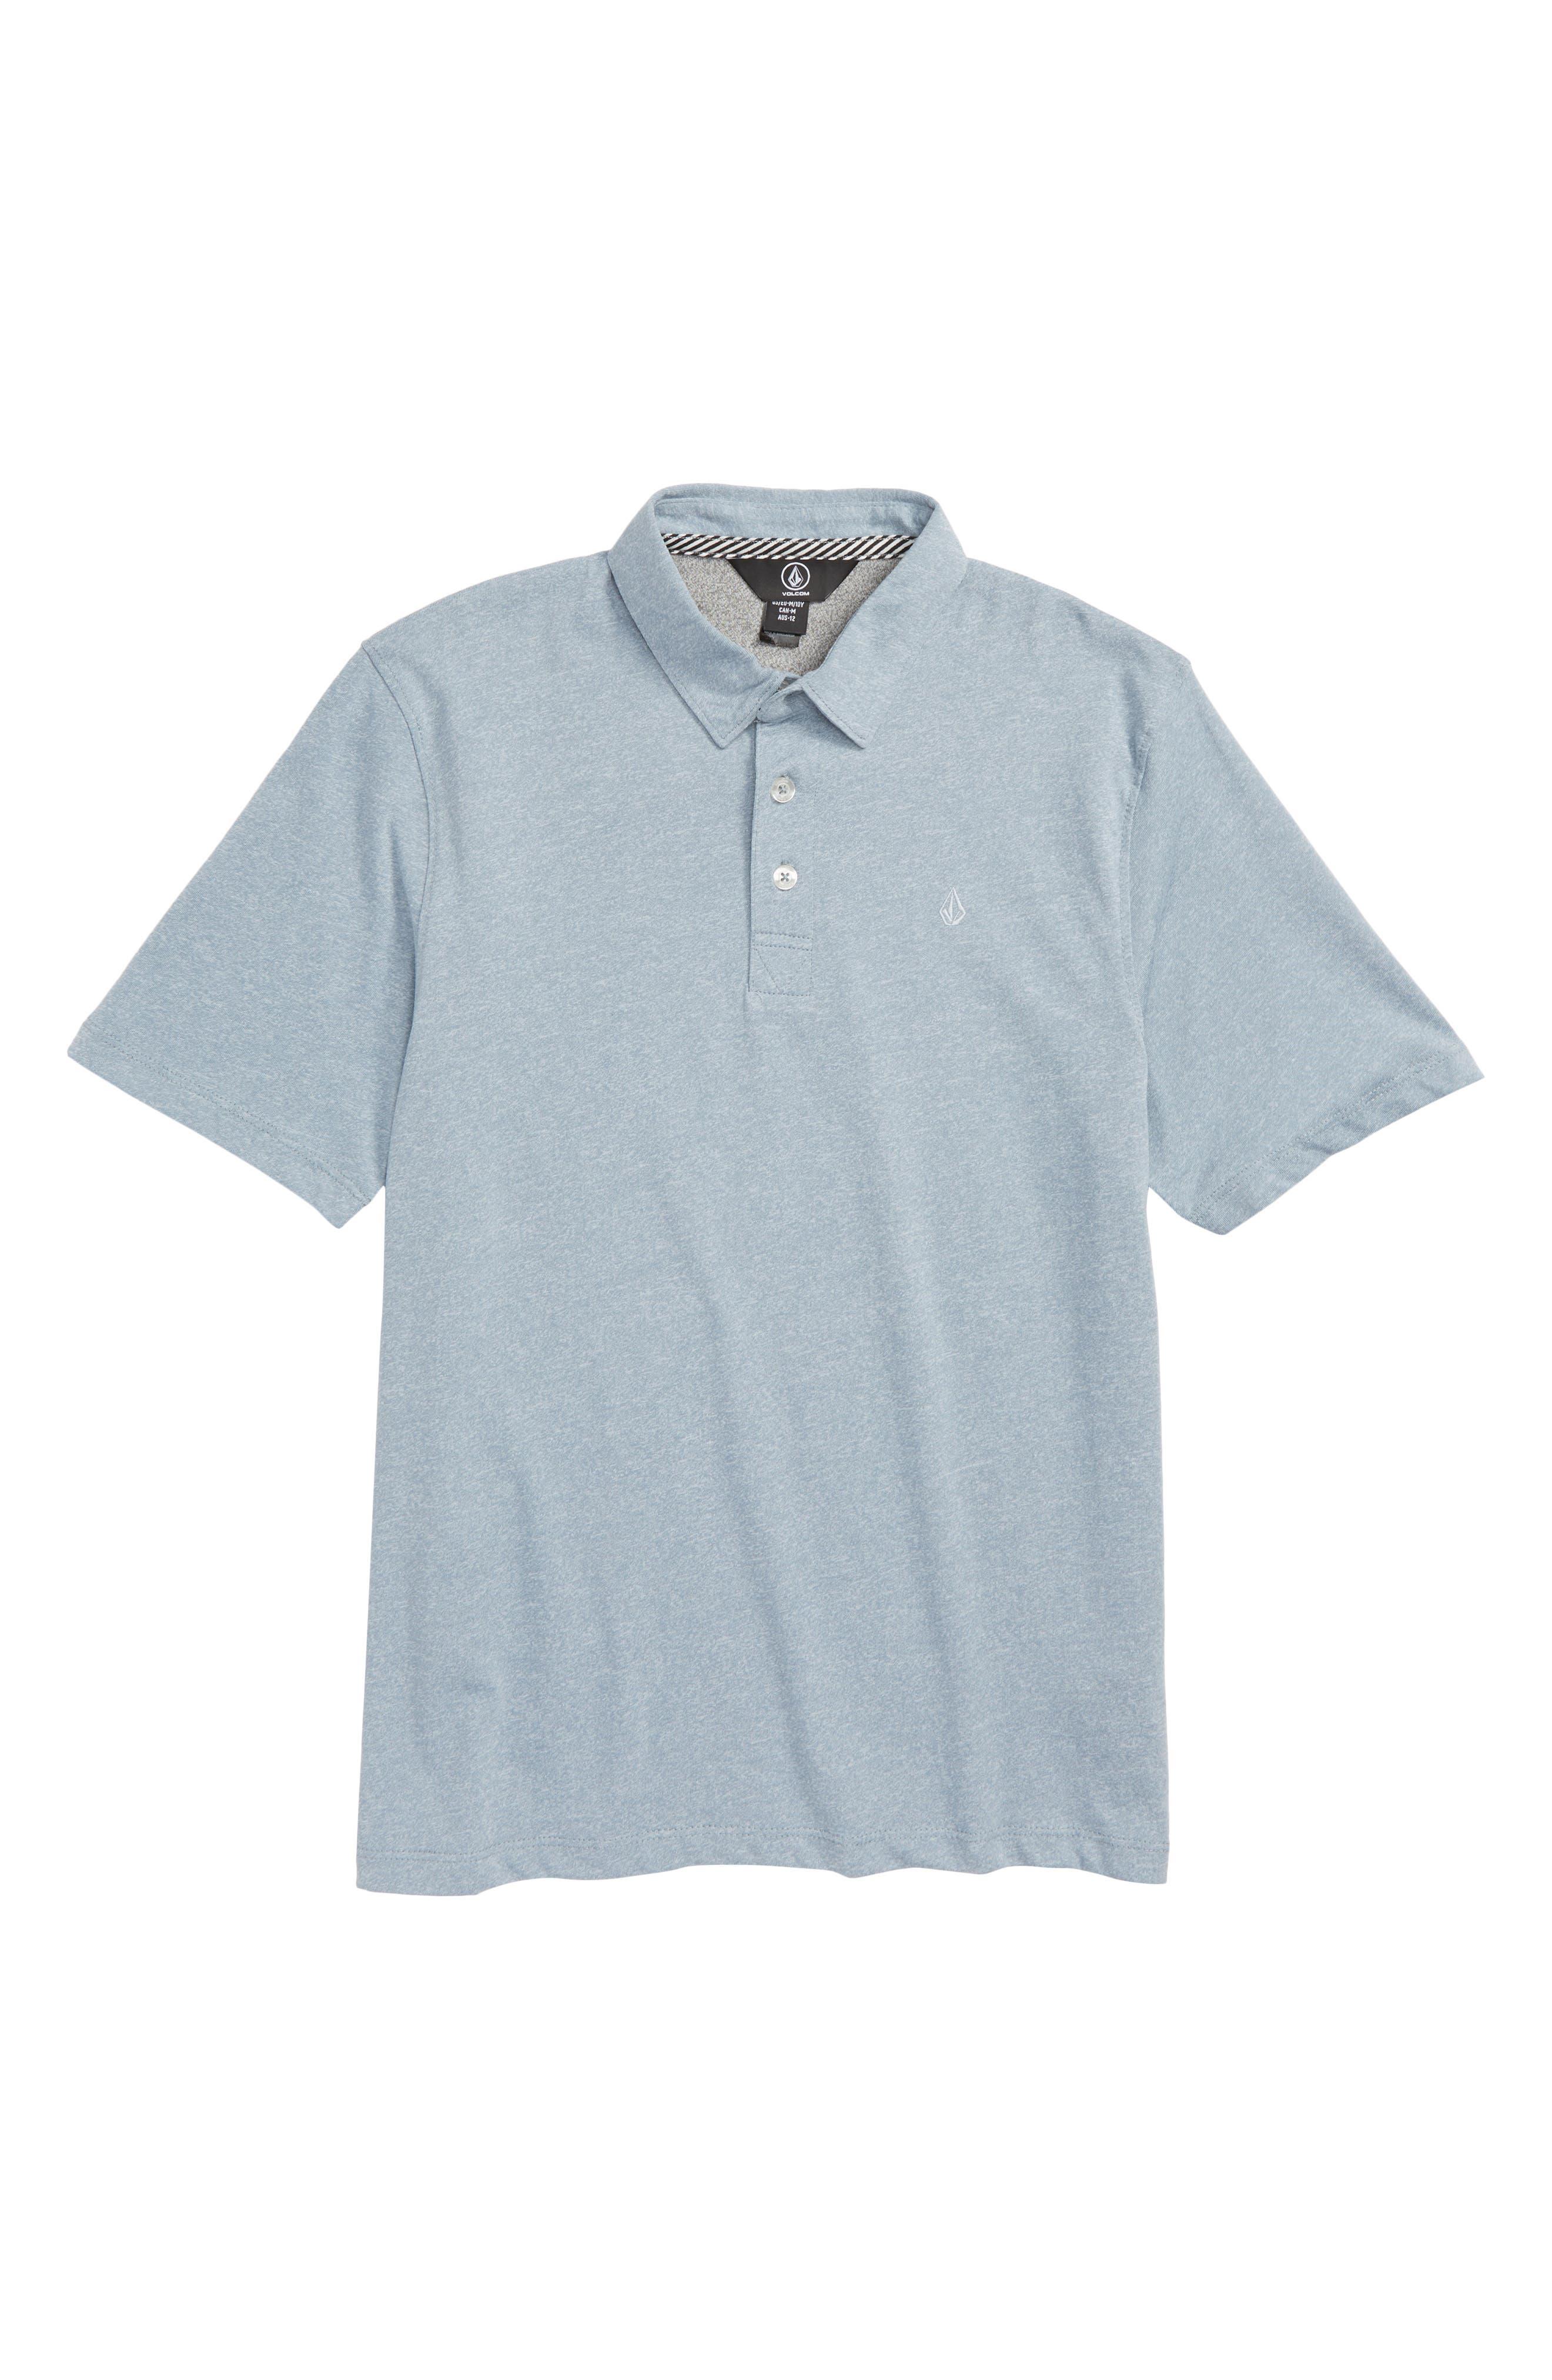 Wowzer Polo,                         Main,                         color, 038